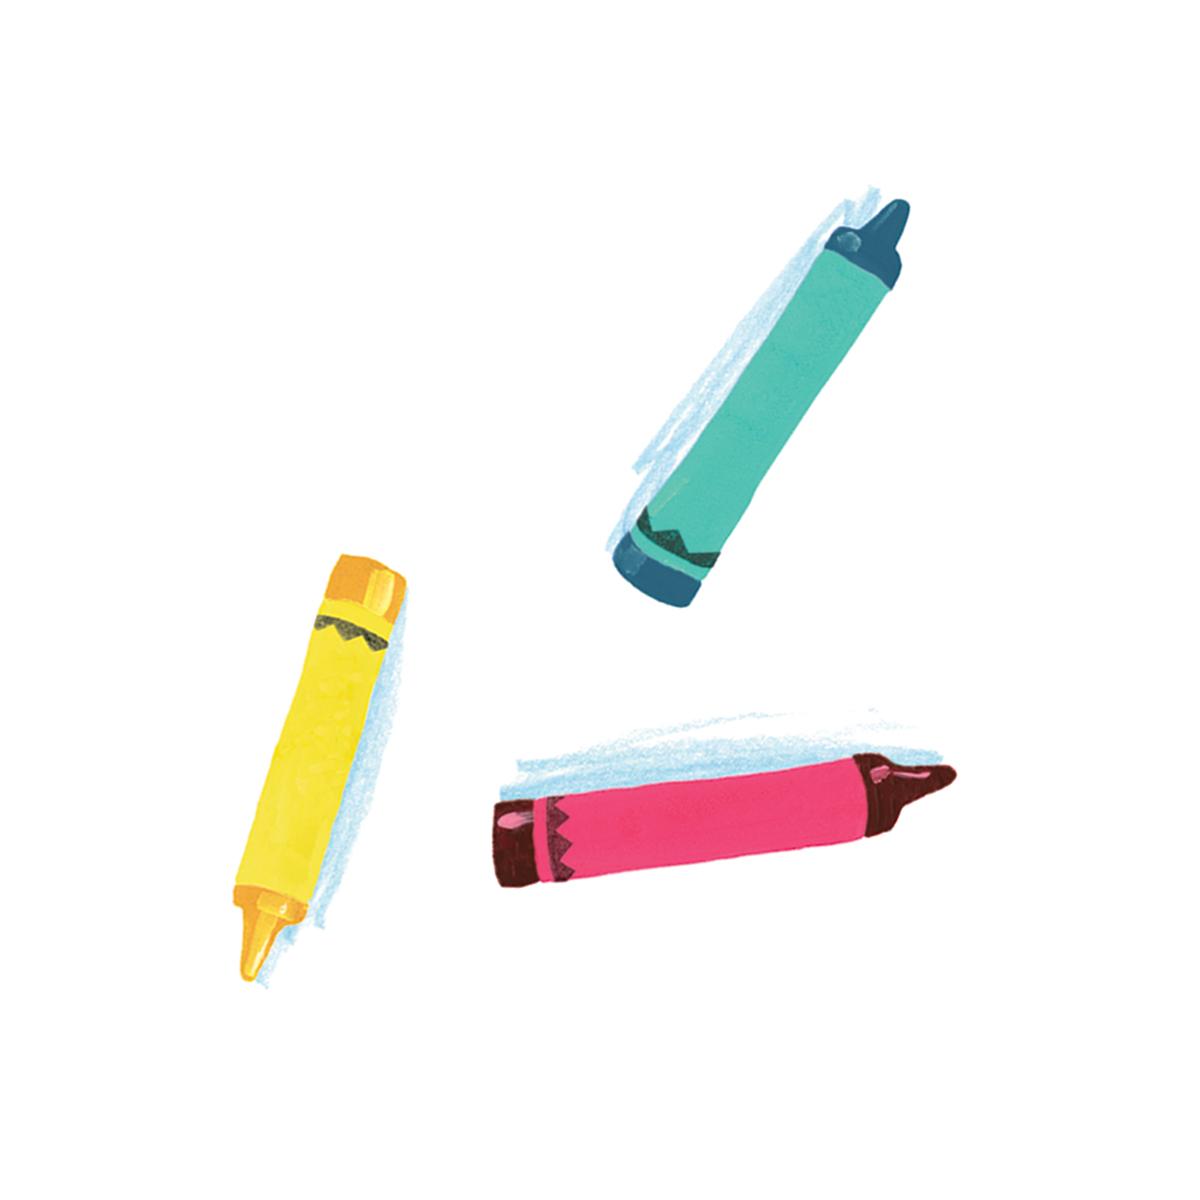 crayons1.jpg